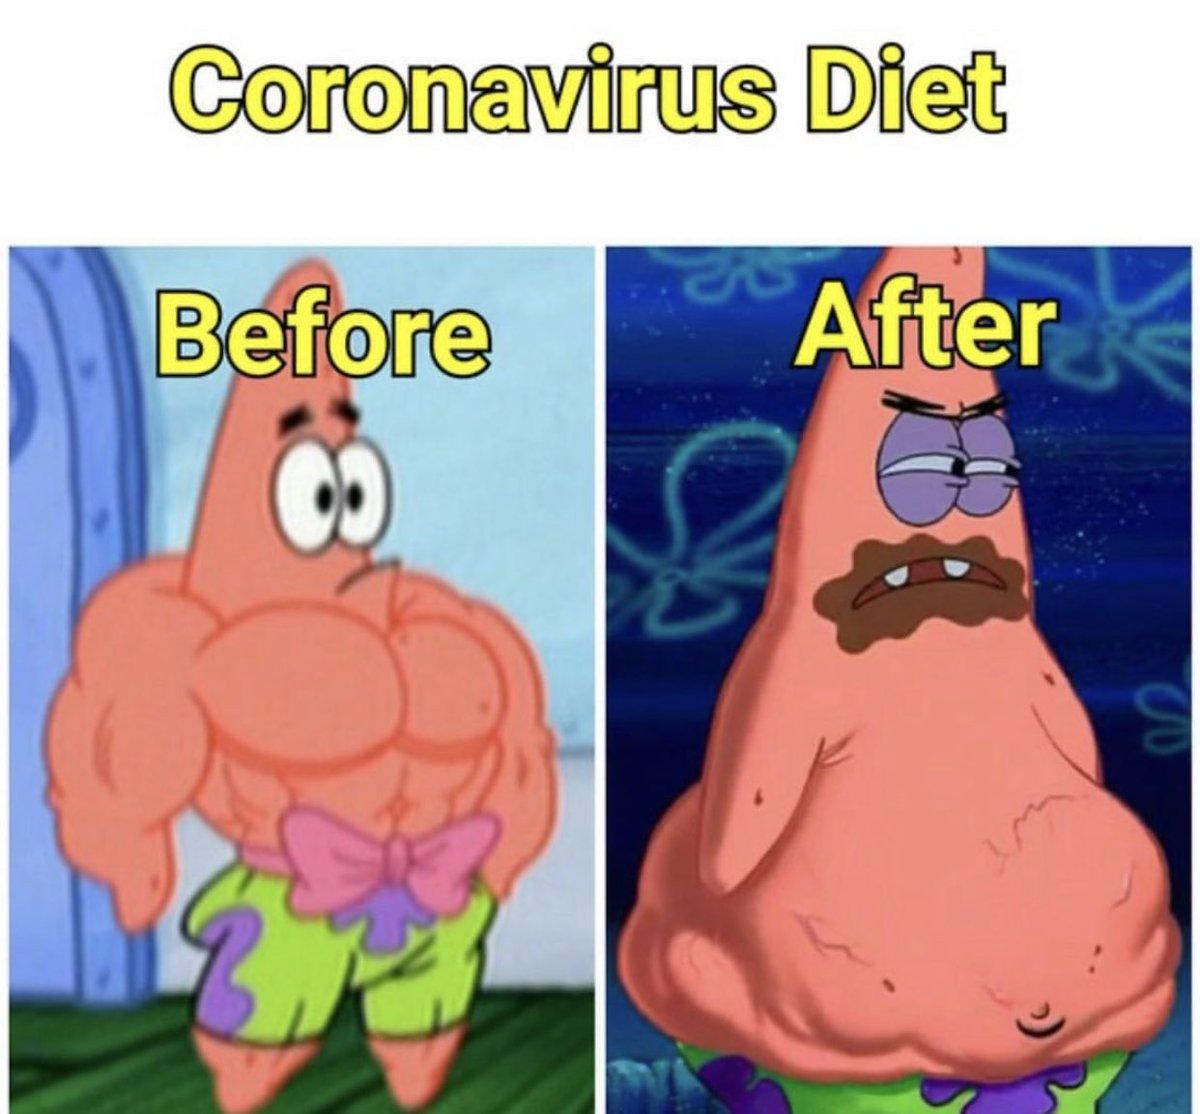 Accurate!!! #coronavirus #IsolationLife #fatass #feedme #eat #sleep #repeat